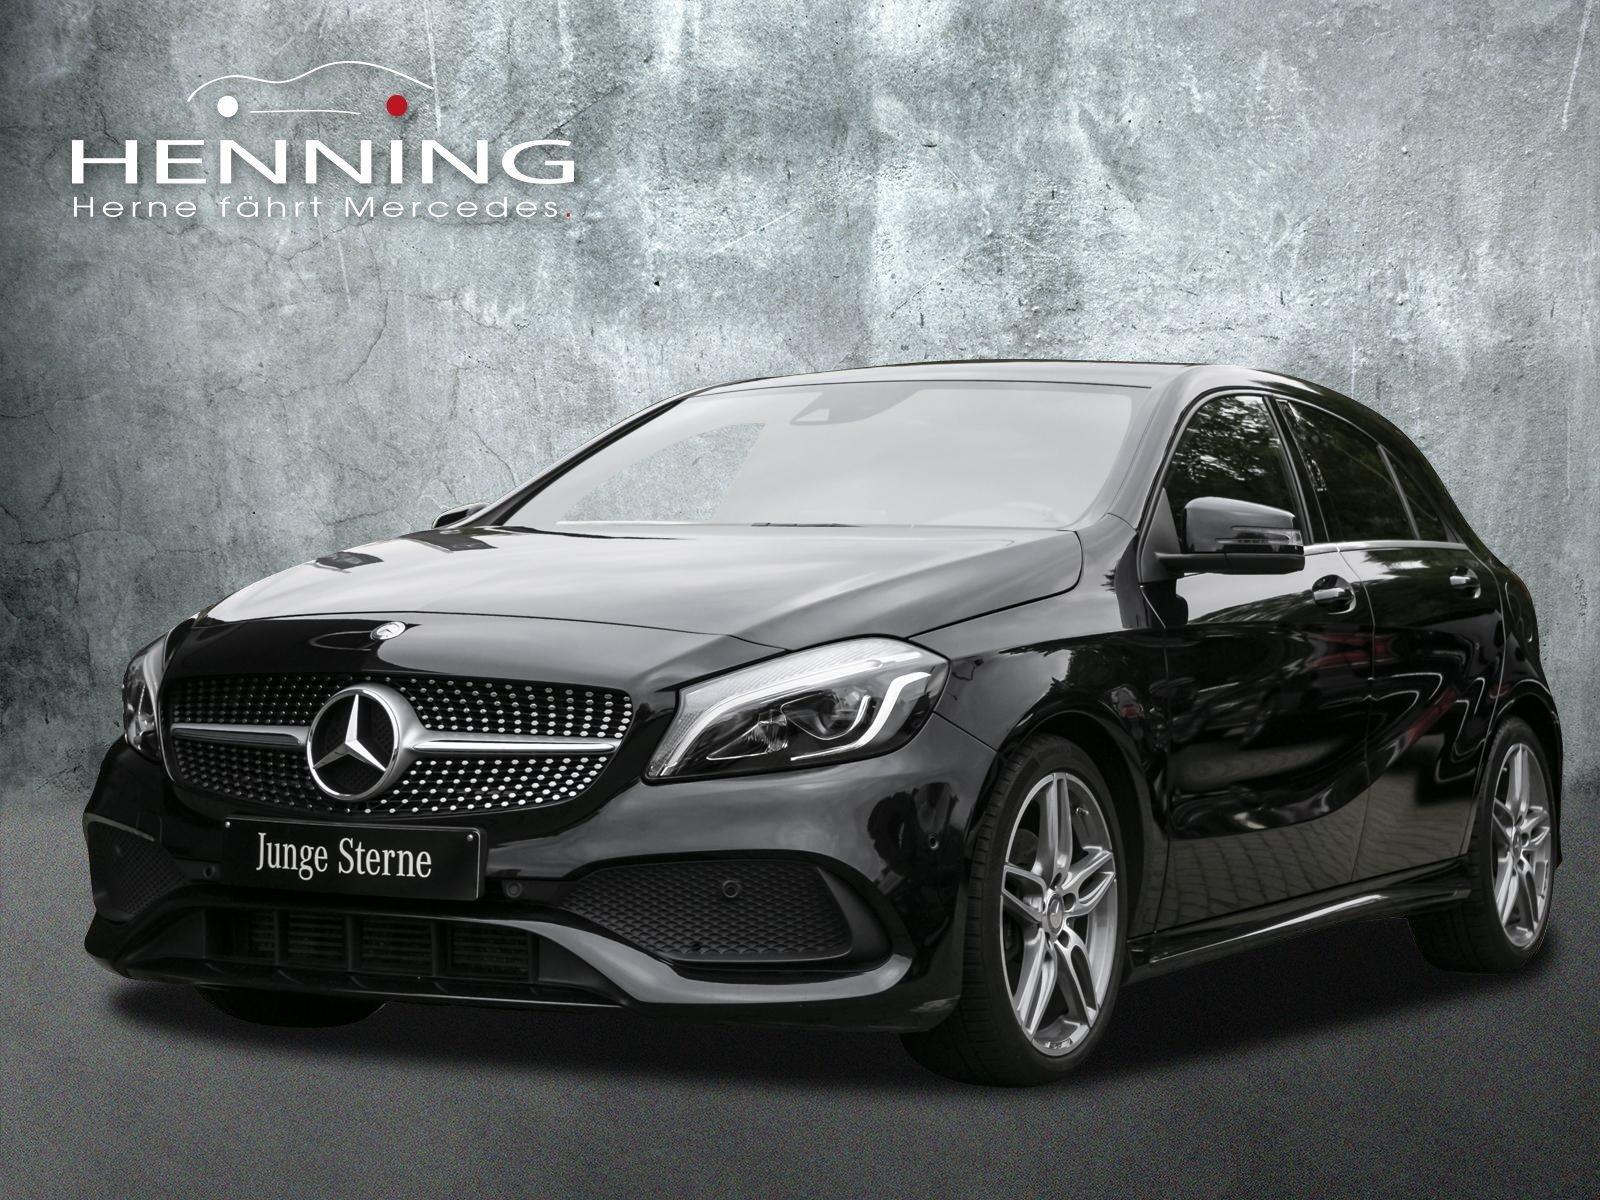 Mercedes-Benz A 180 AMG 7G LED Comand Klima Tempomat CarPlay, Jahr 2016, Benzin